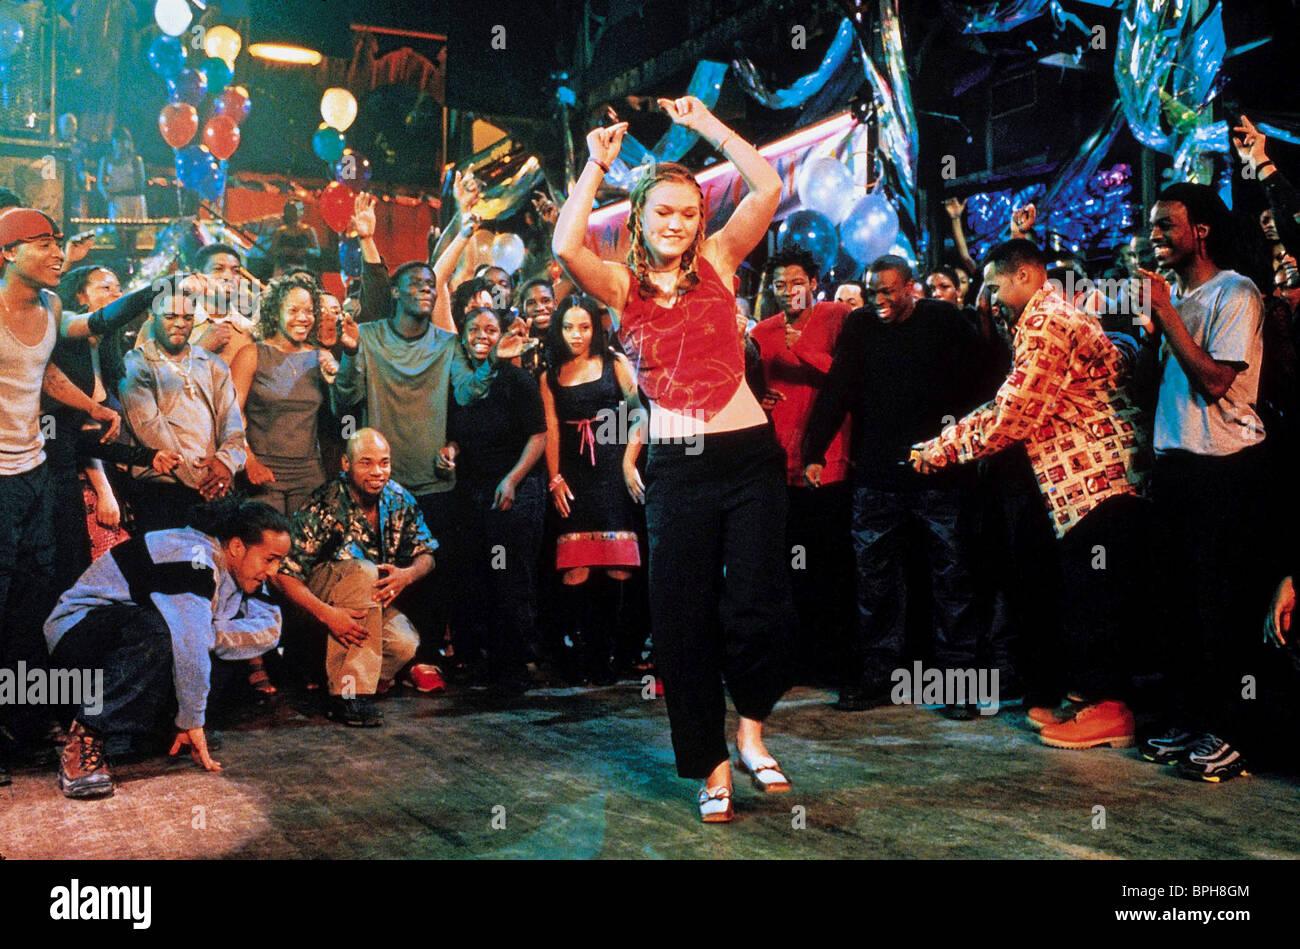 Julia Stiles Save The Last Dance 2001 Stock Photo 31112724